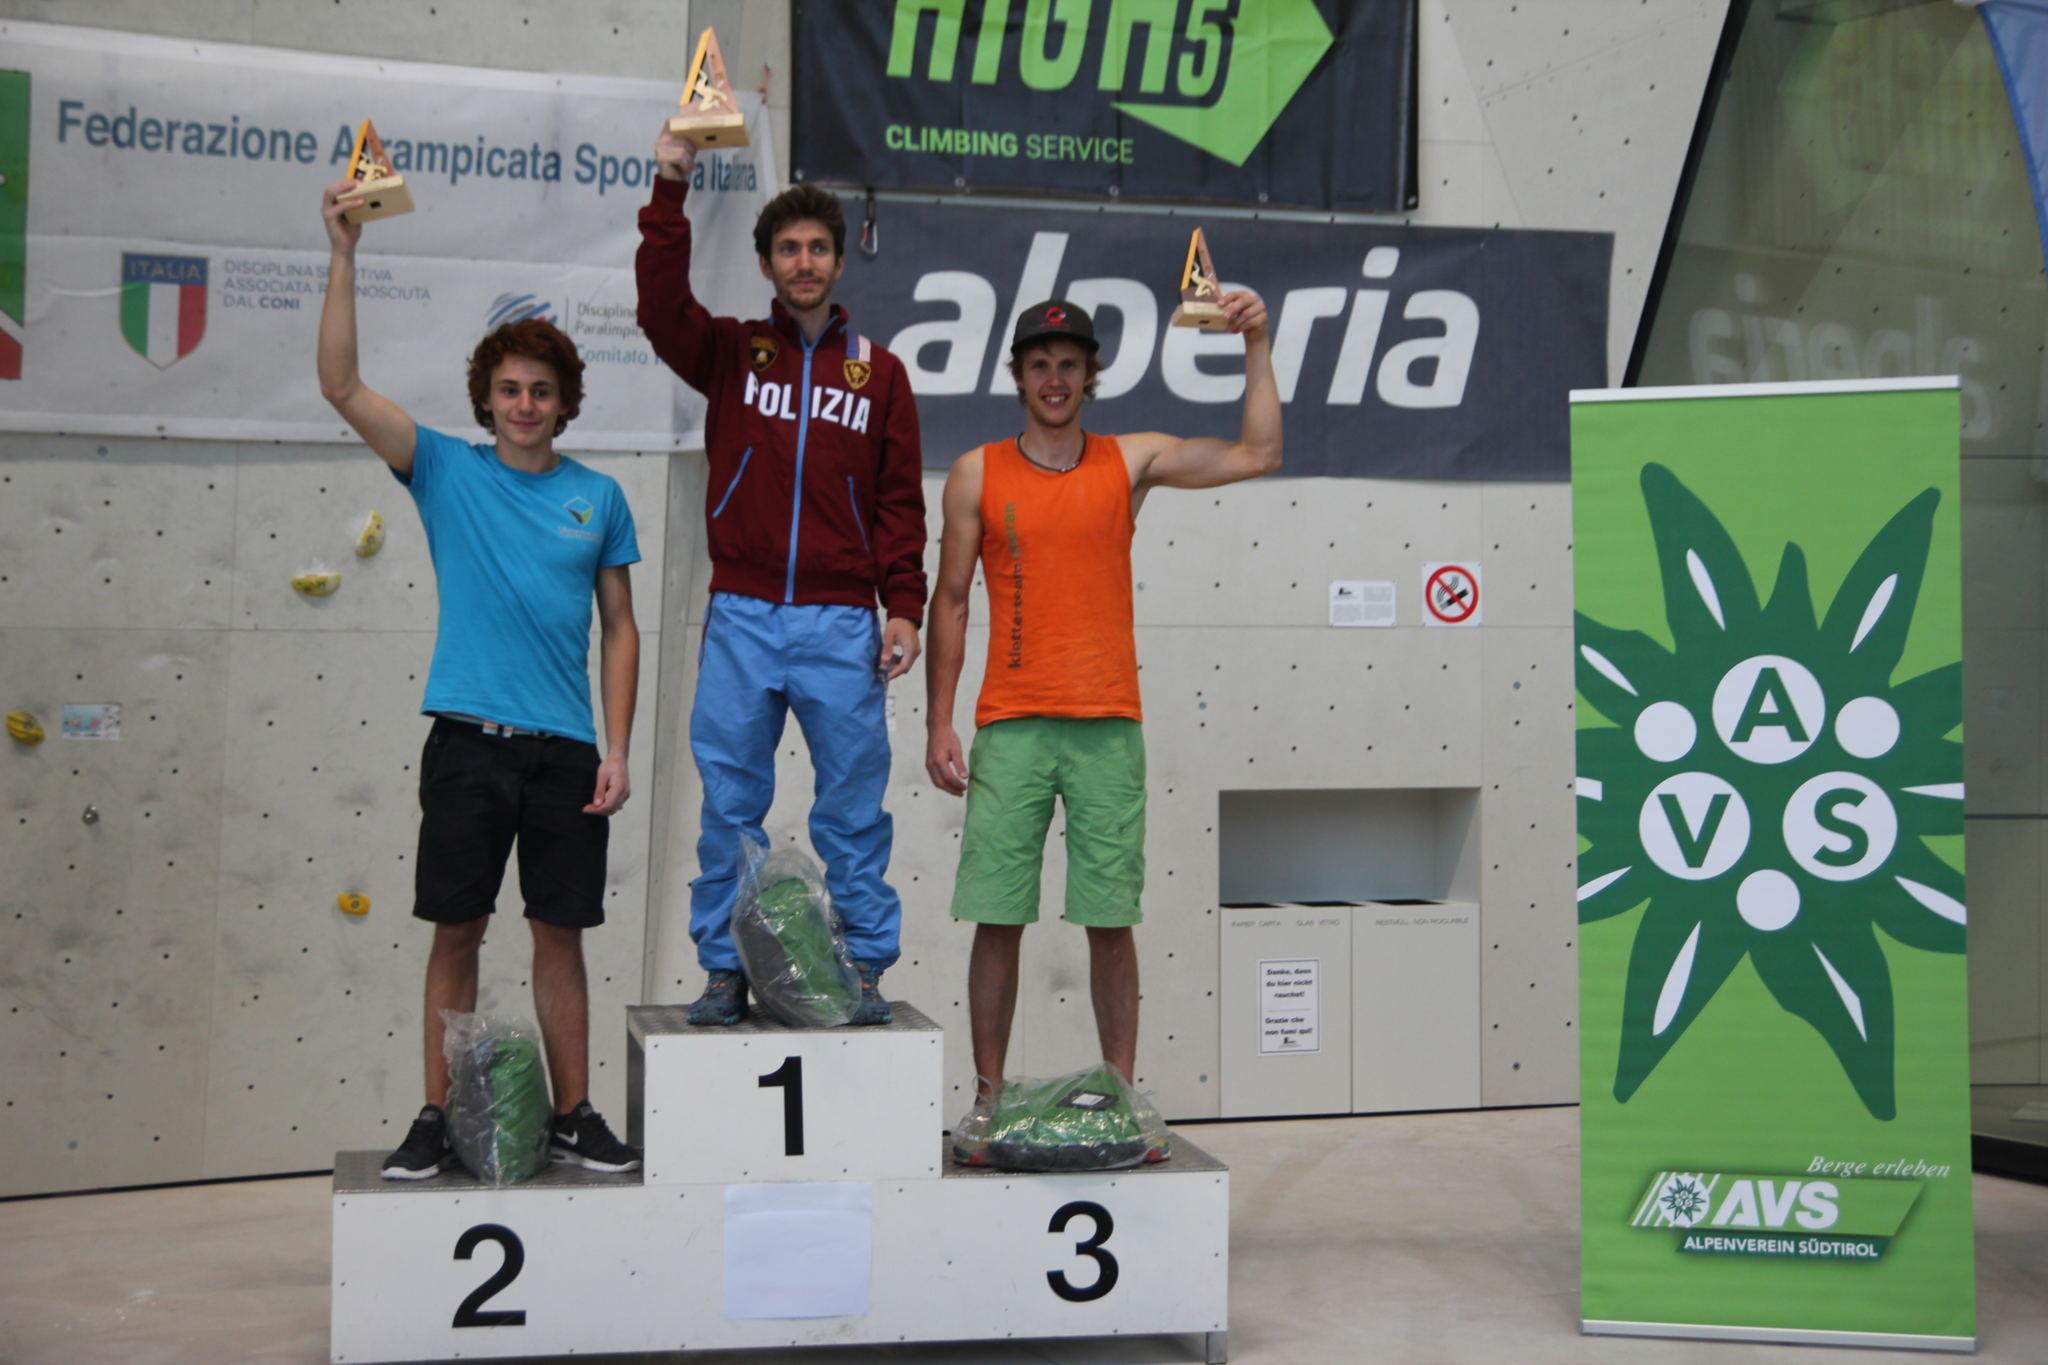 Südtiroler Sportkletterer überzeugen beim Italiencup in Bruneck